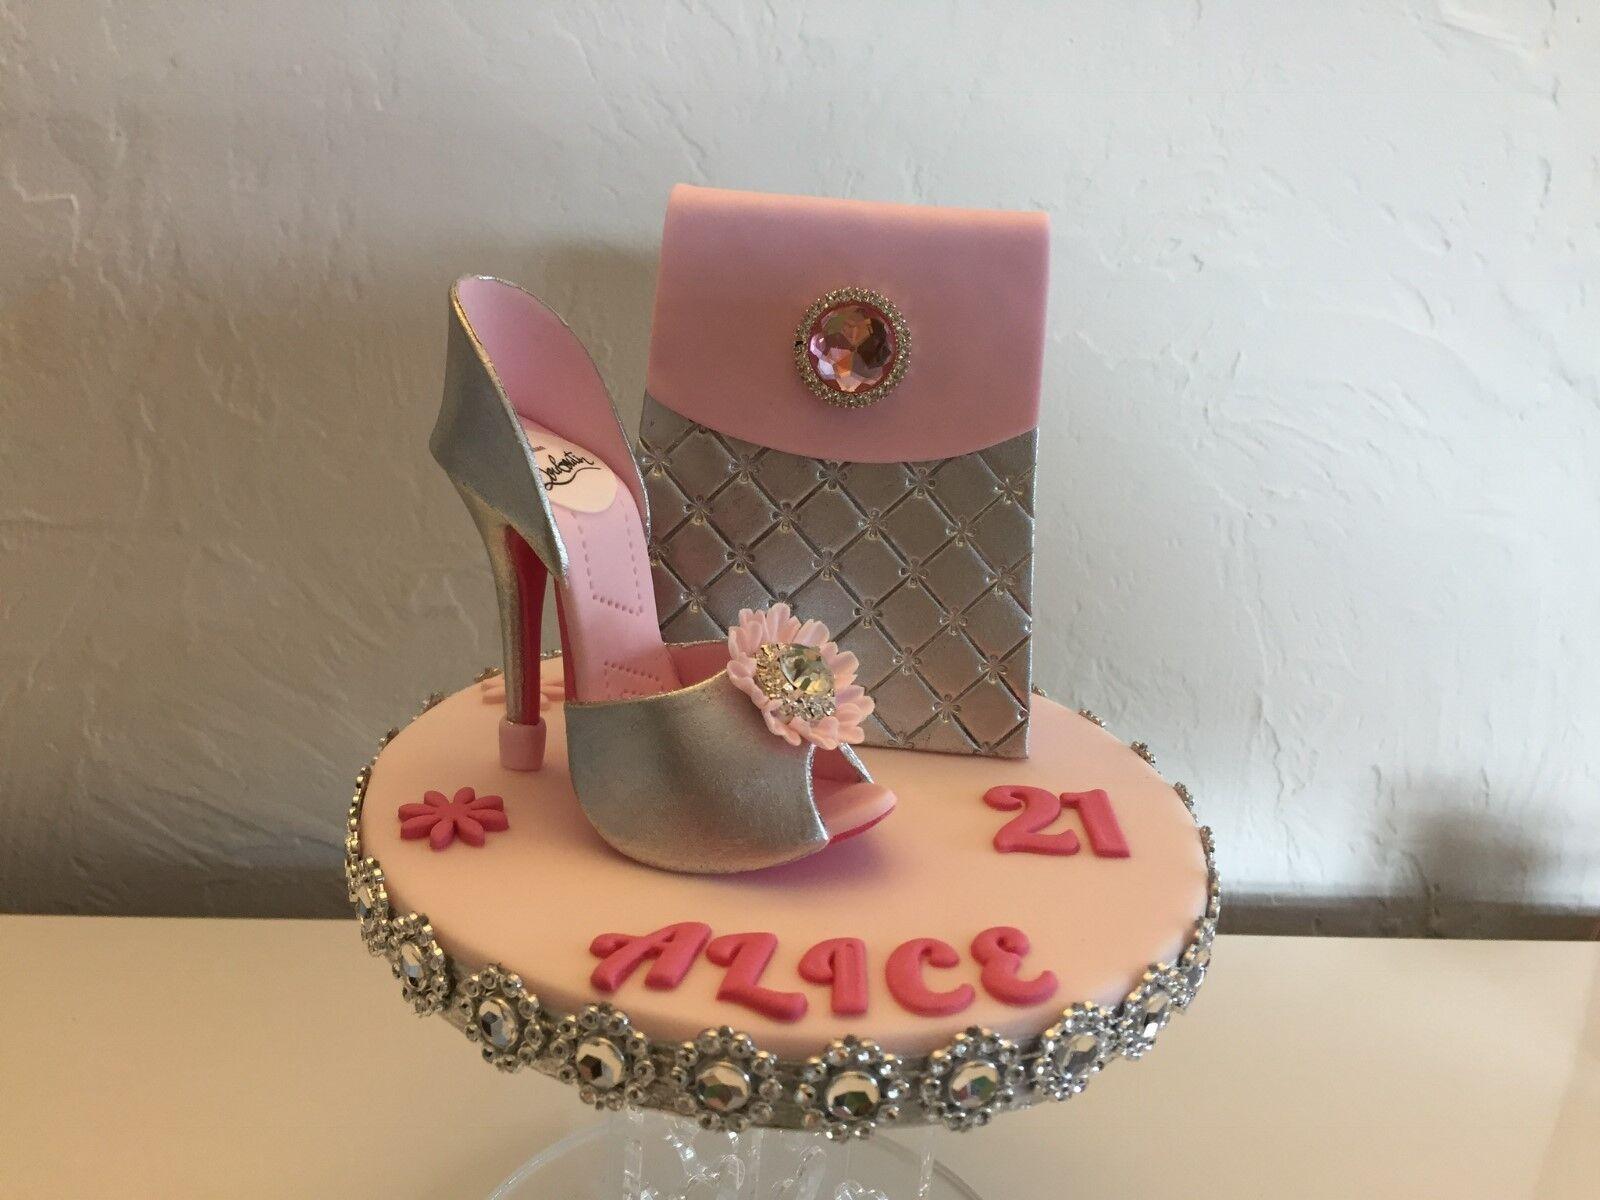 Sugar schuhe & Handbag , designer brand tags, metallics, Top your own Cake